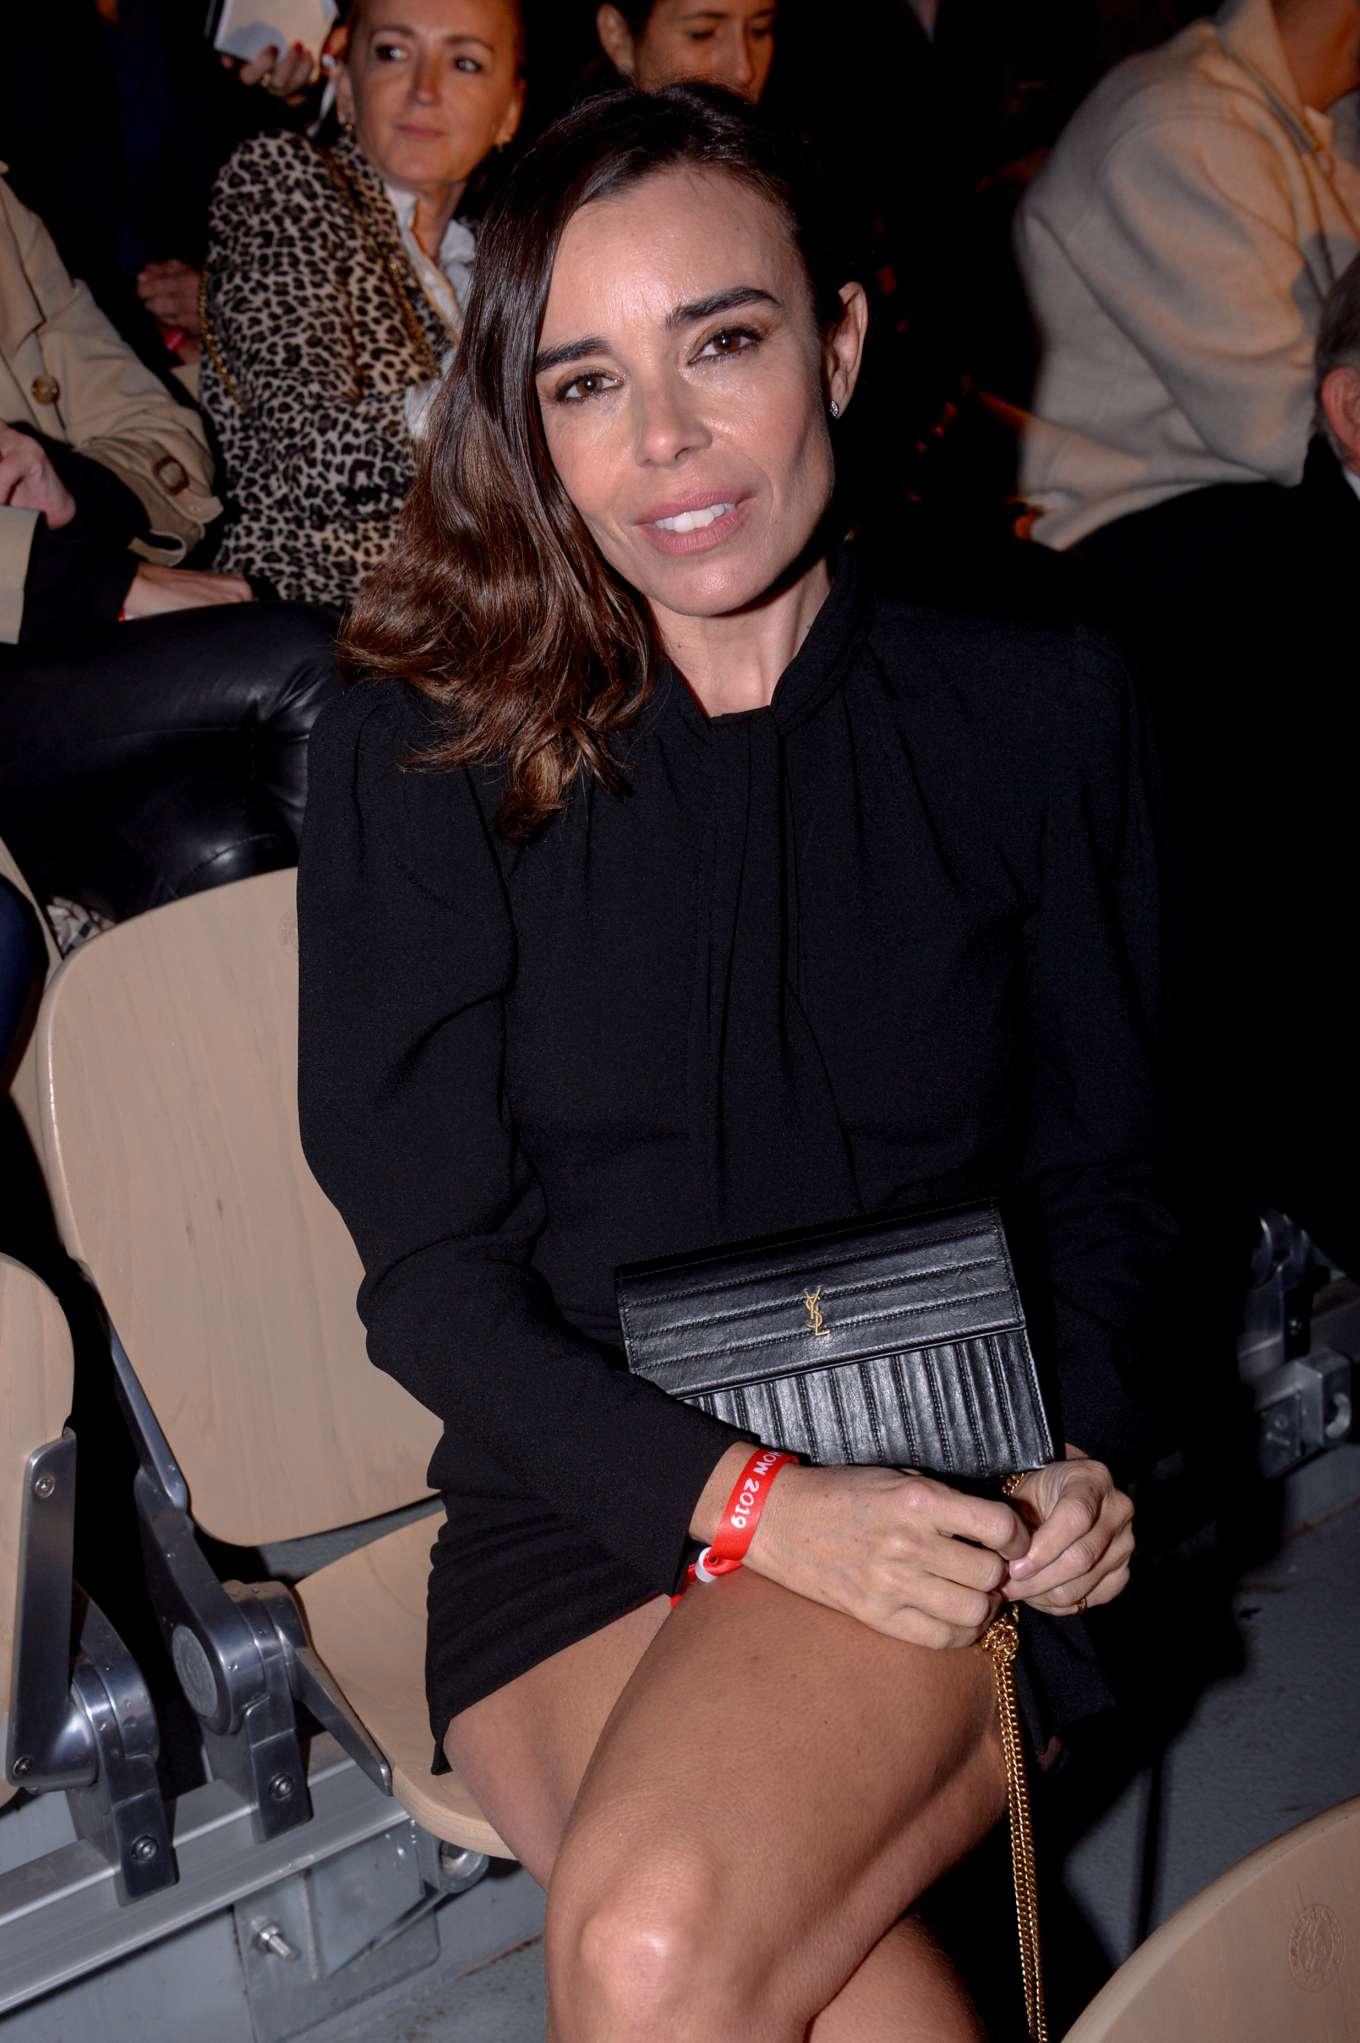 Elodie Bouchez 2019 : Elodie Bouchez – Saint Laurent Womenswear SS 2020 Show at Paris Fashion Week-07